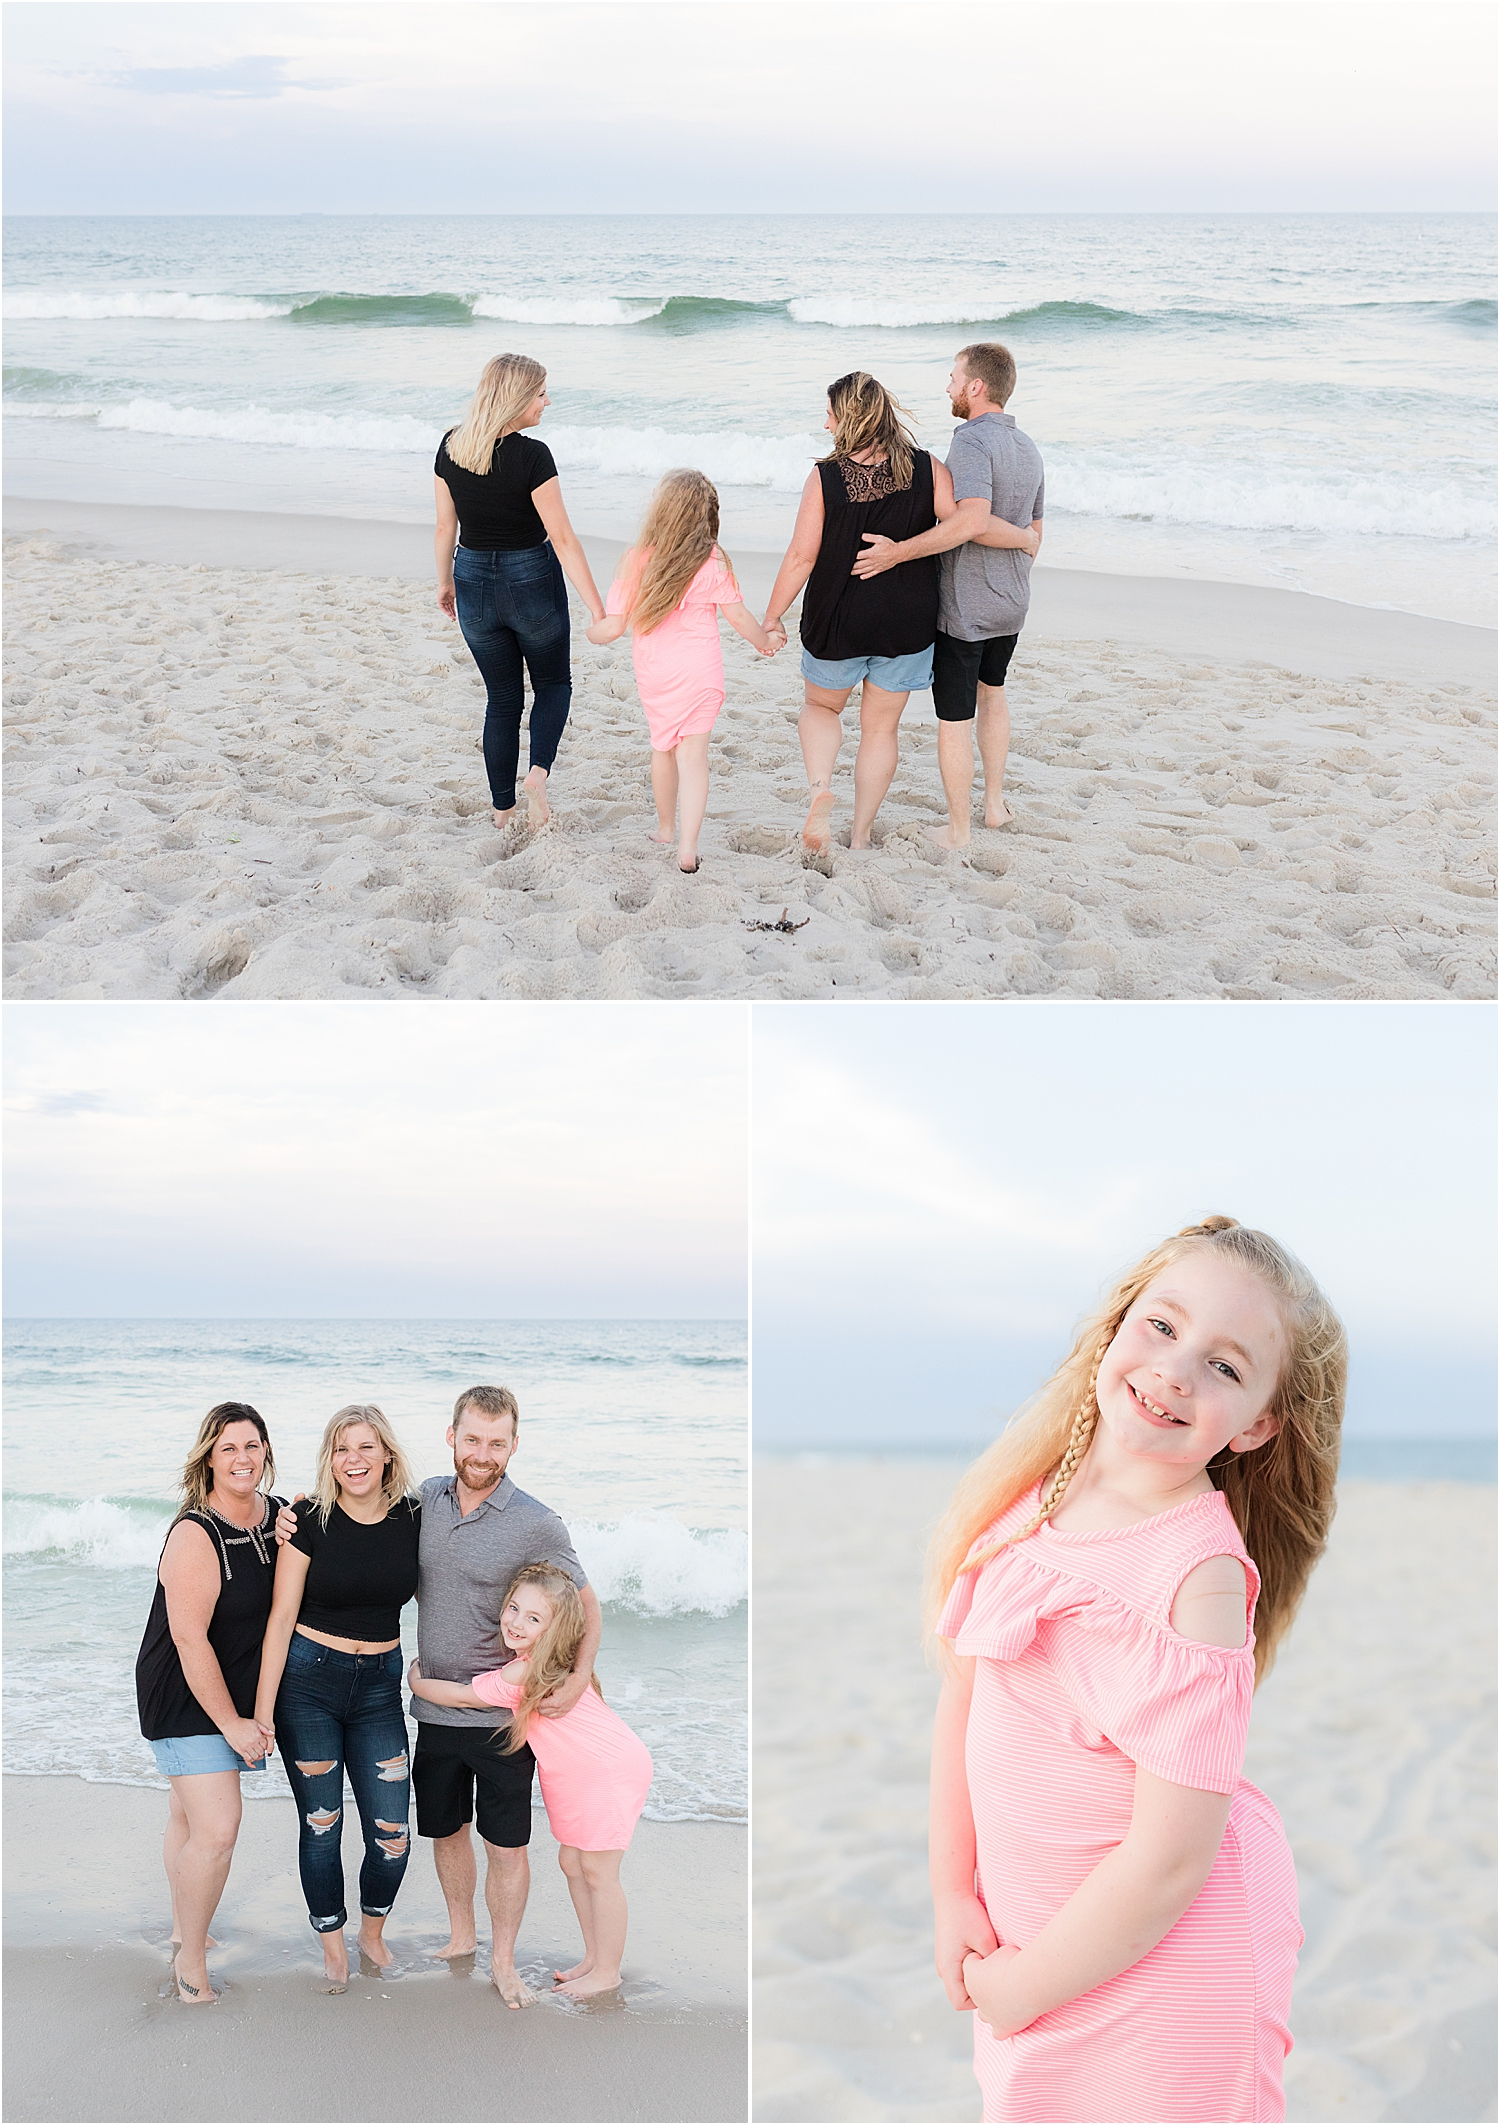 nj-family-beach-photo_1212.jpg